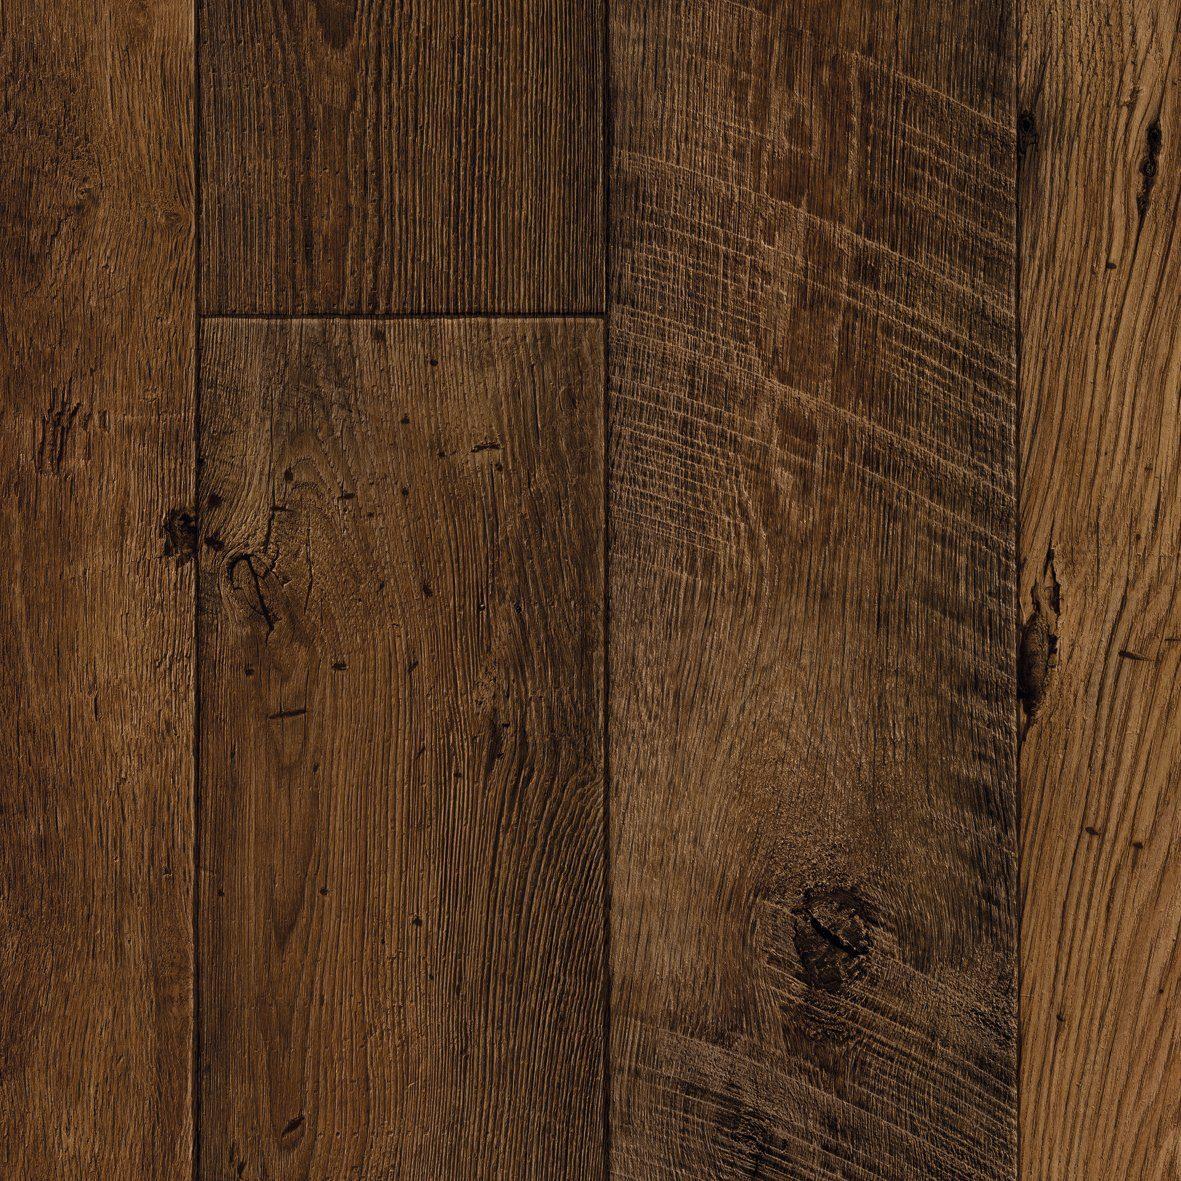 ANDIAMO PVC-Boden »Elegance«, Stab-Optik Dunkelbraun, Breite 300 cm